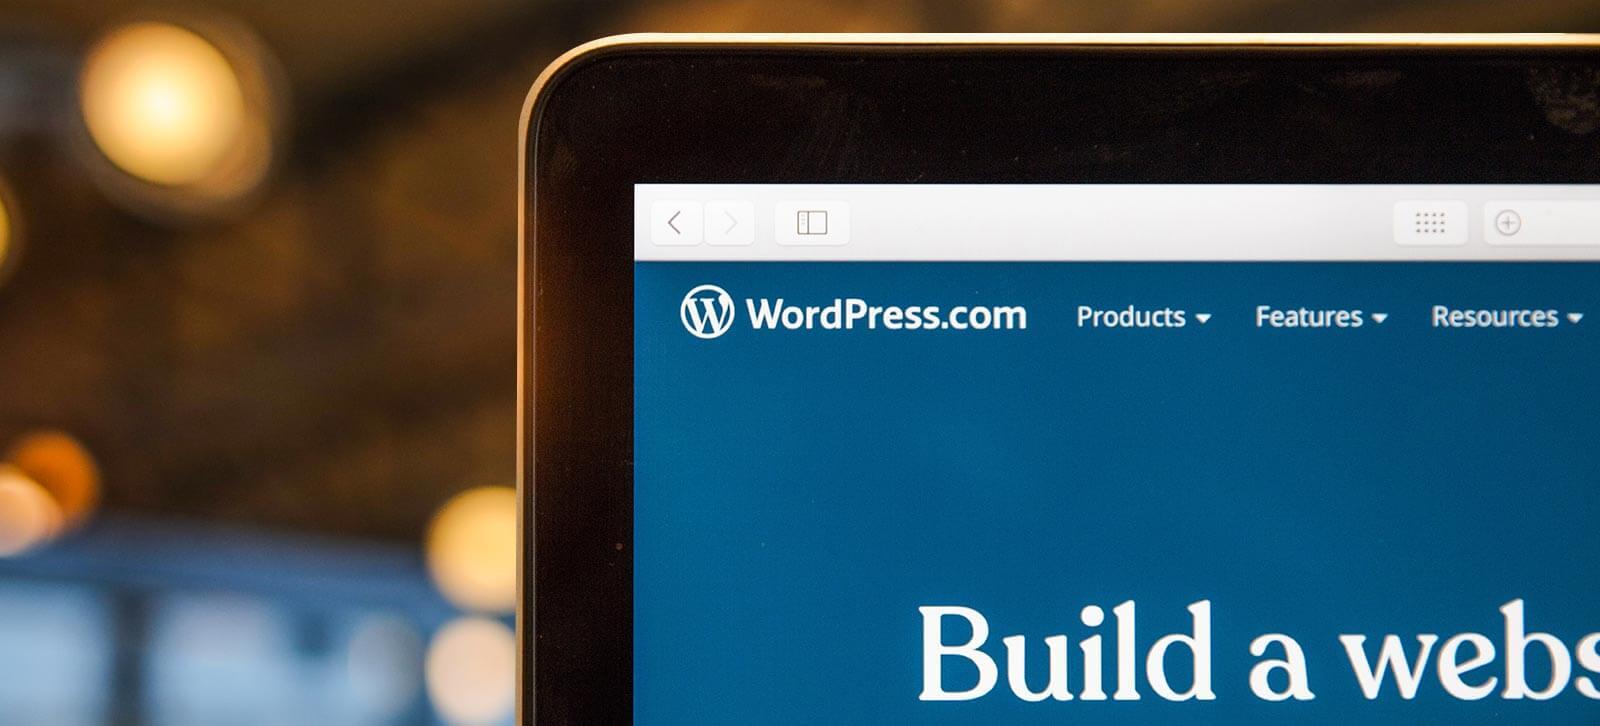 How to Hire a WordPress Web Developer